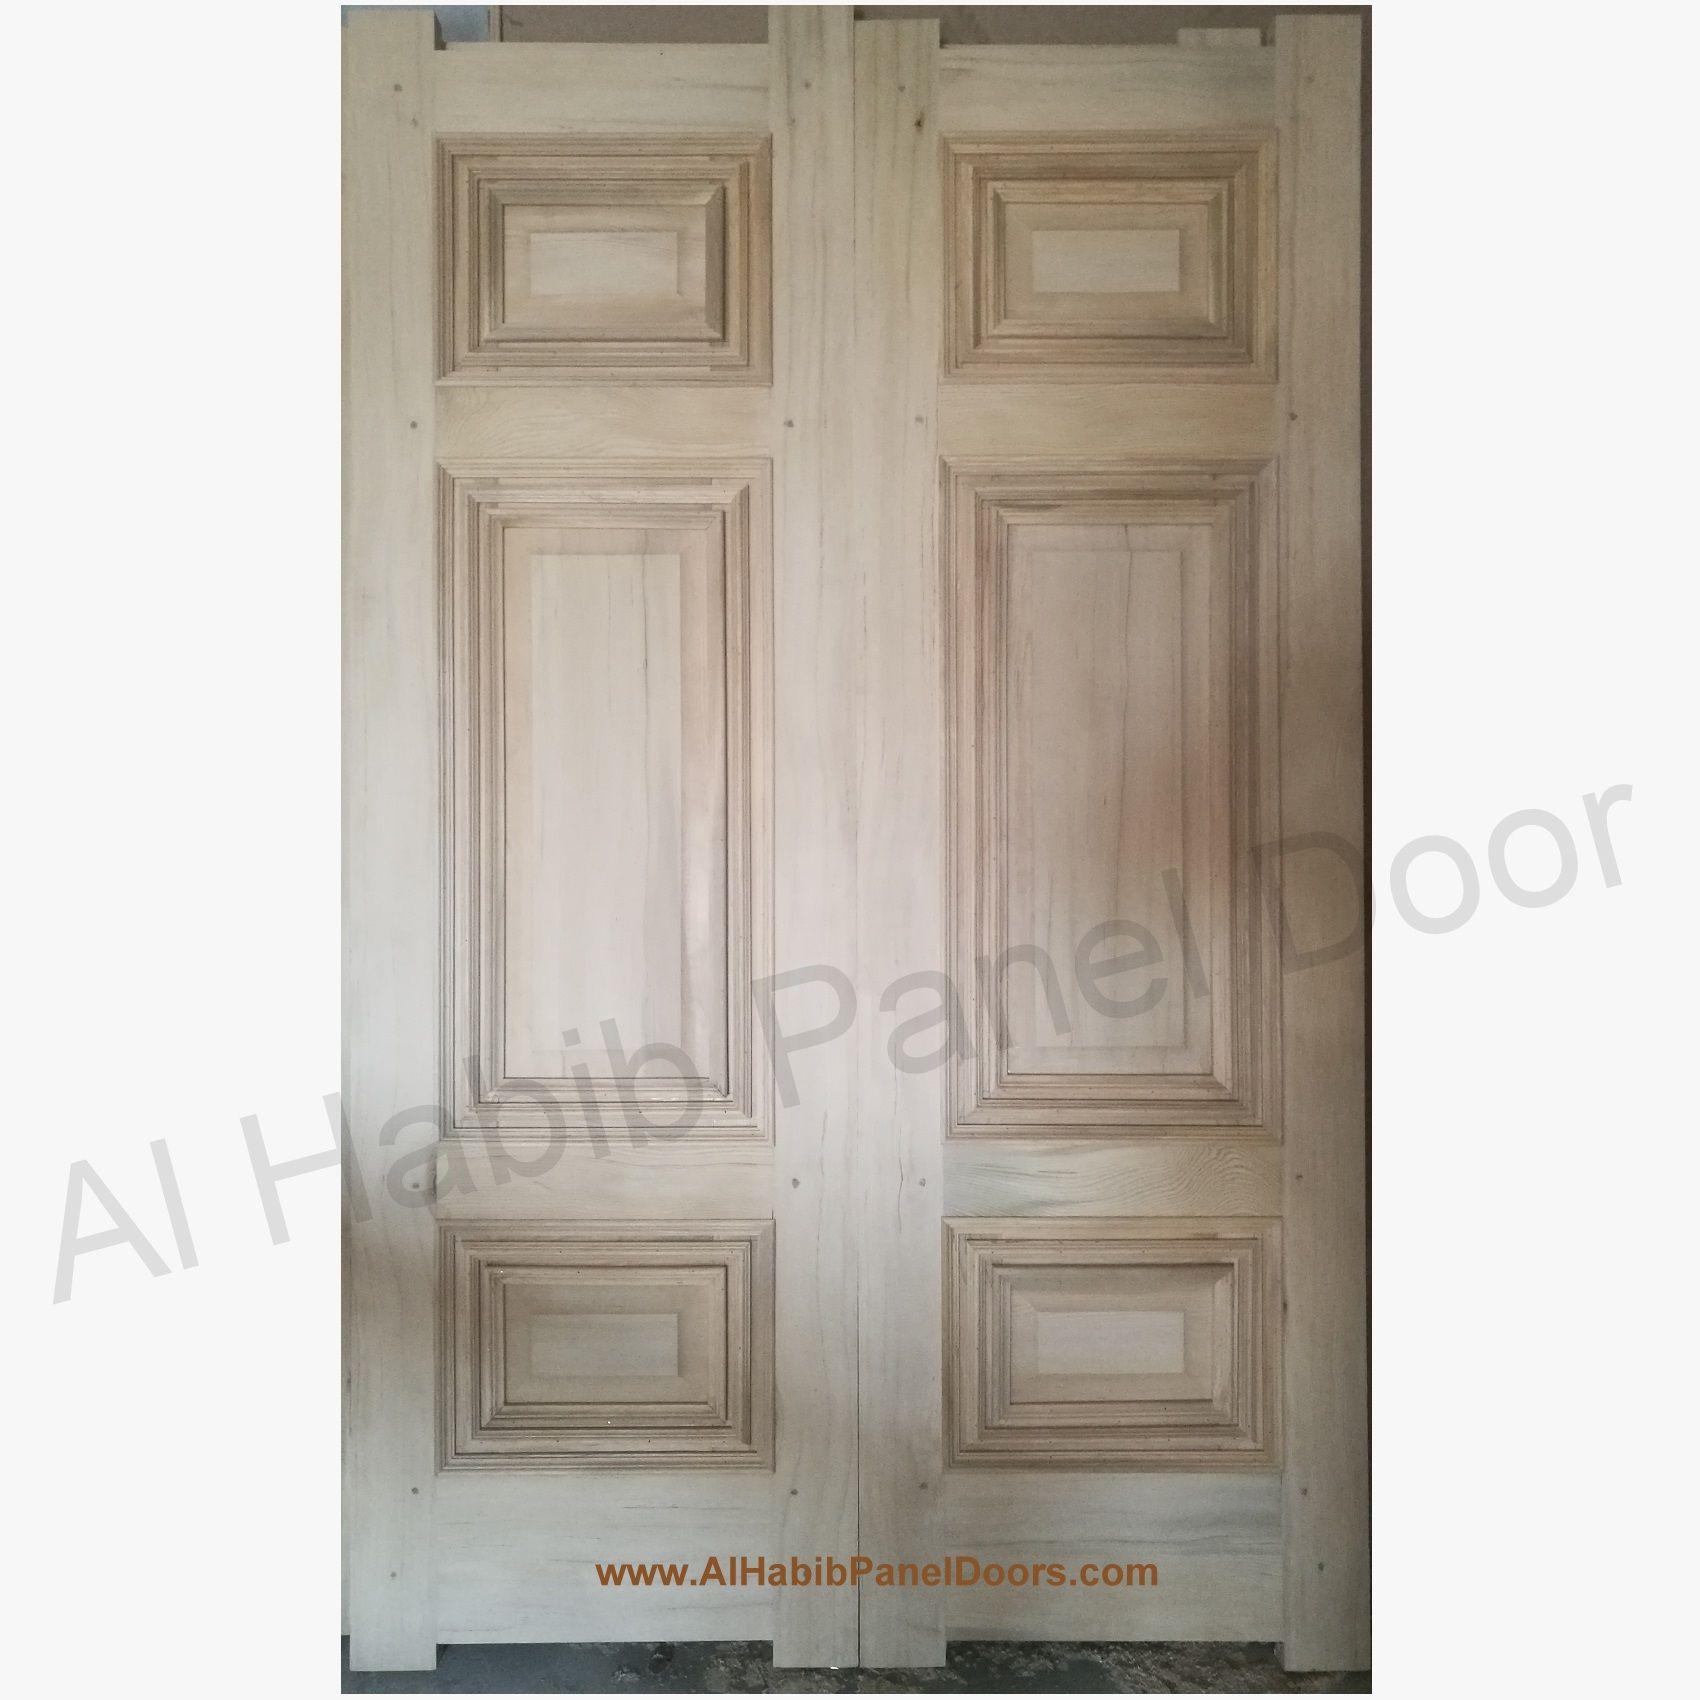 Dayyar Wood Six Panel Main Double Door Hpd575 Main Doors Al